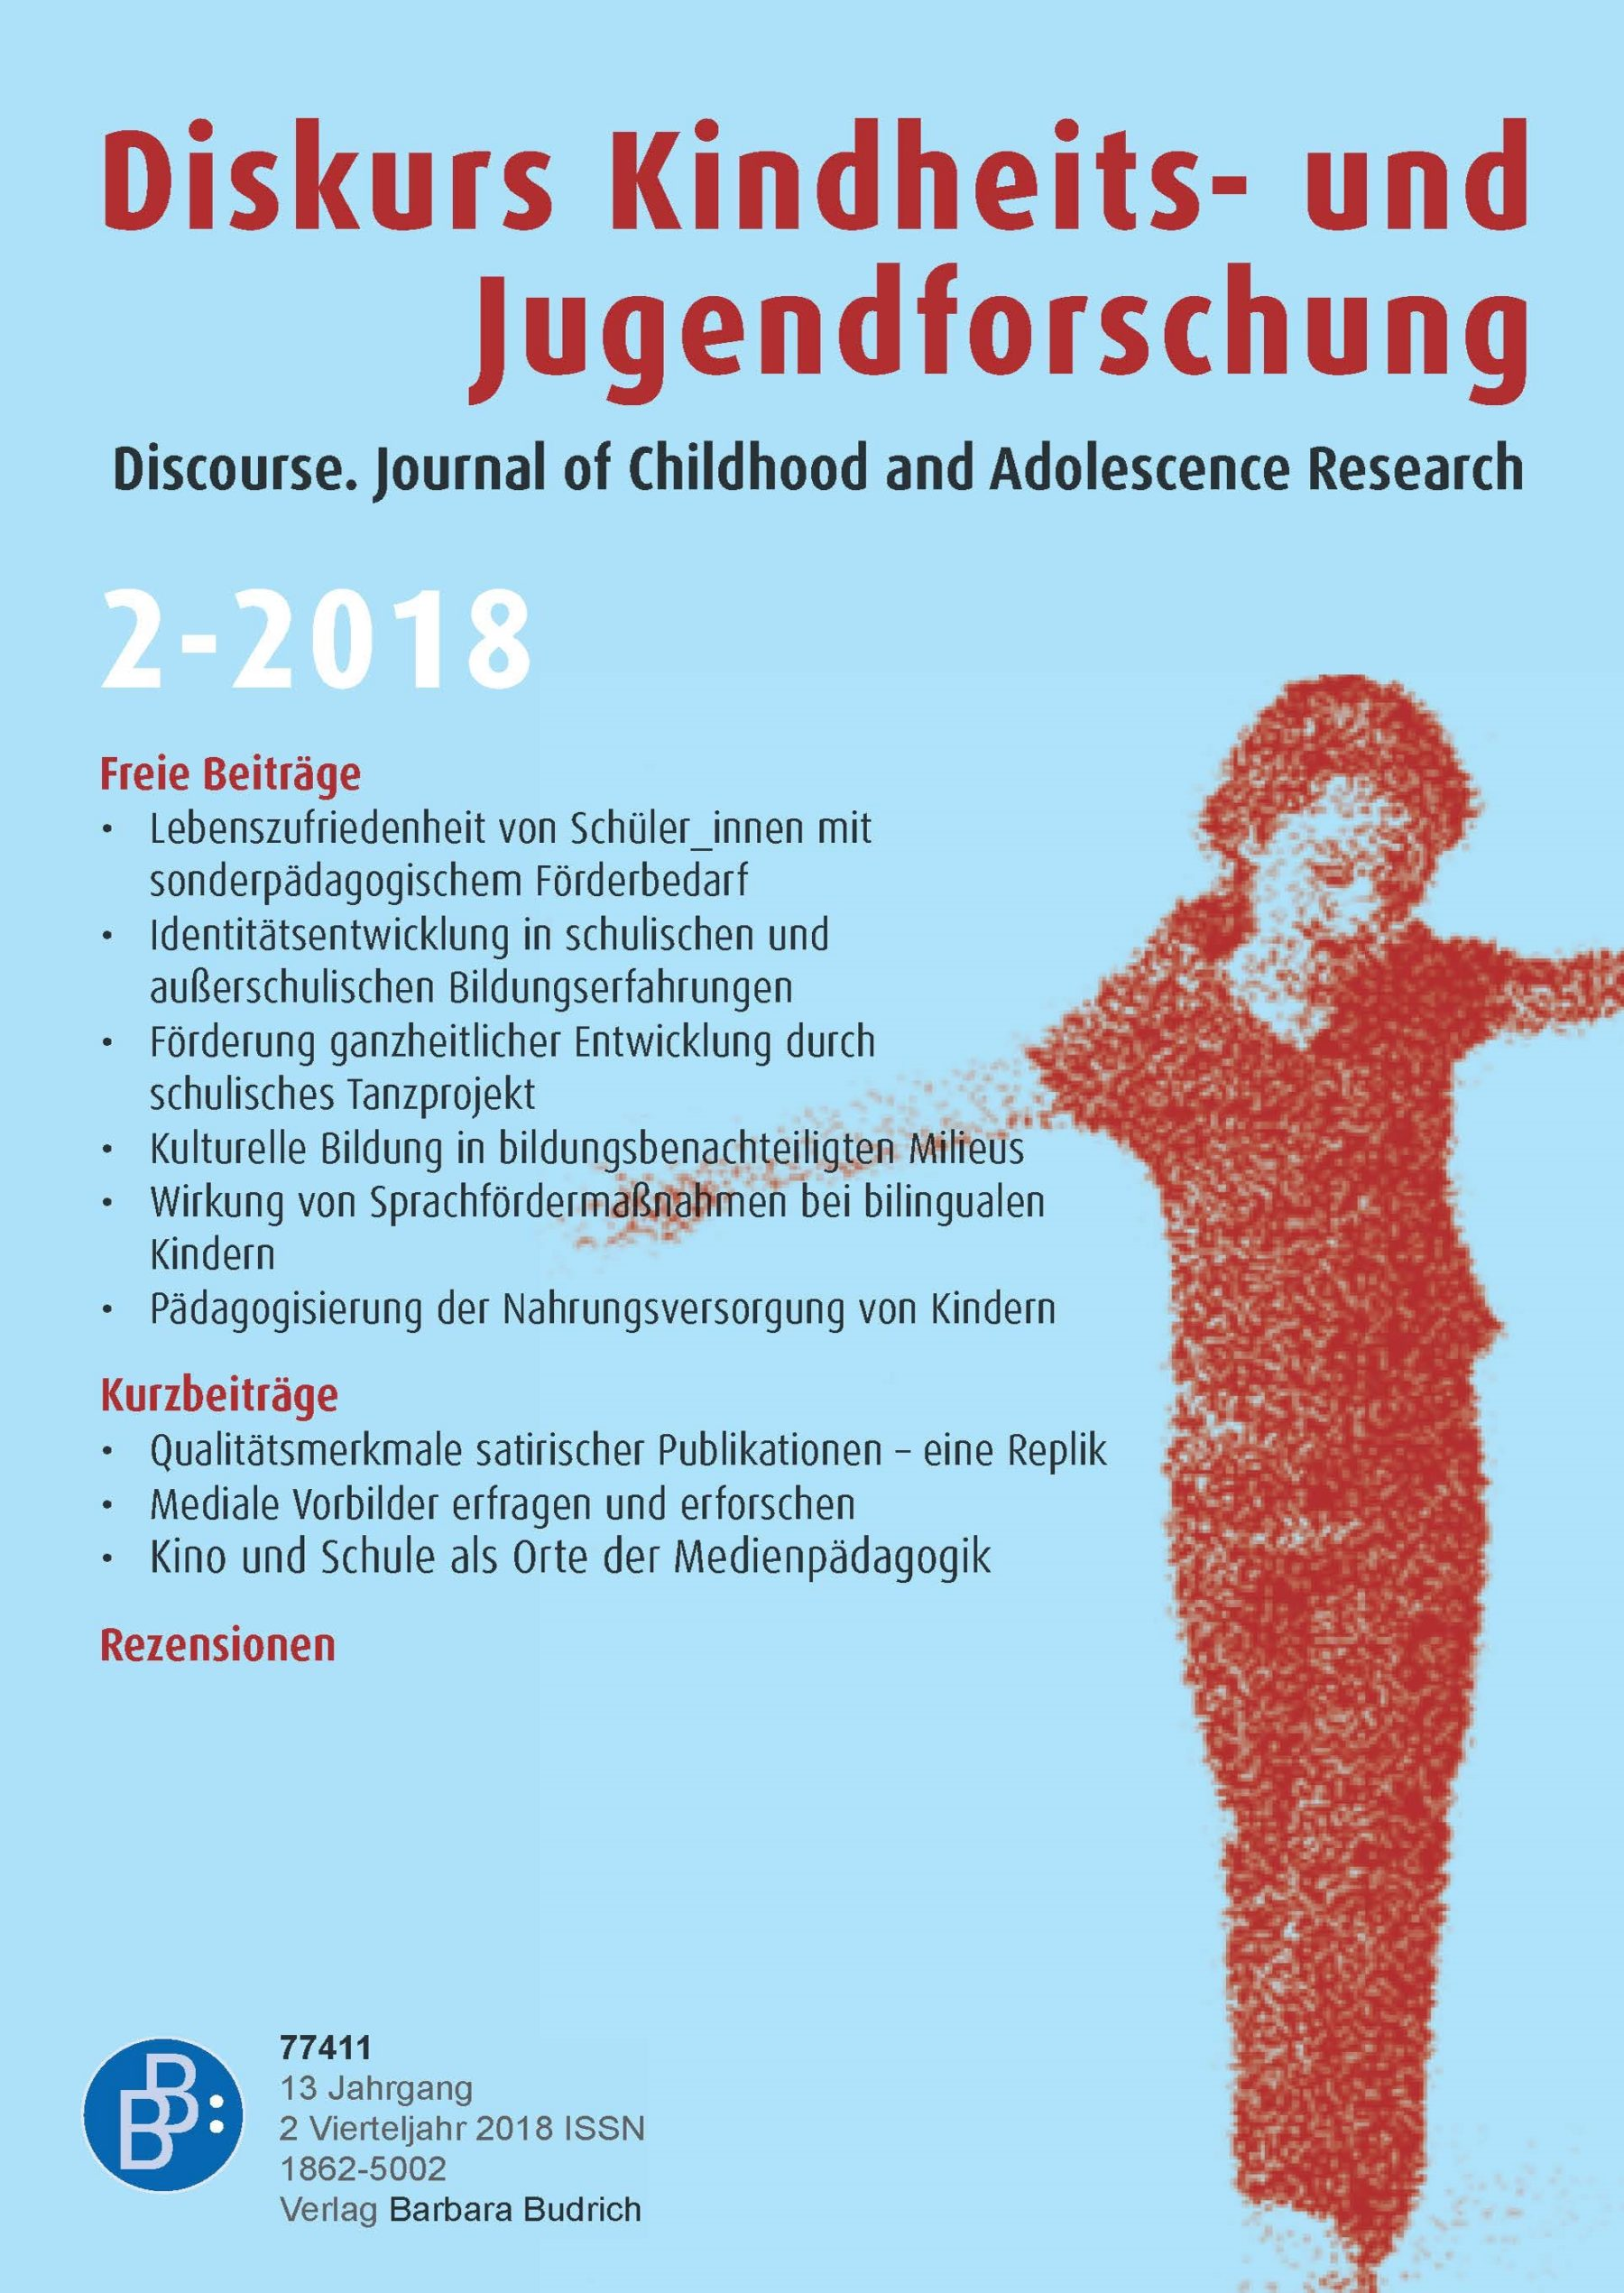 Diskurs 2-2018 | Freie Beiträge